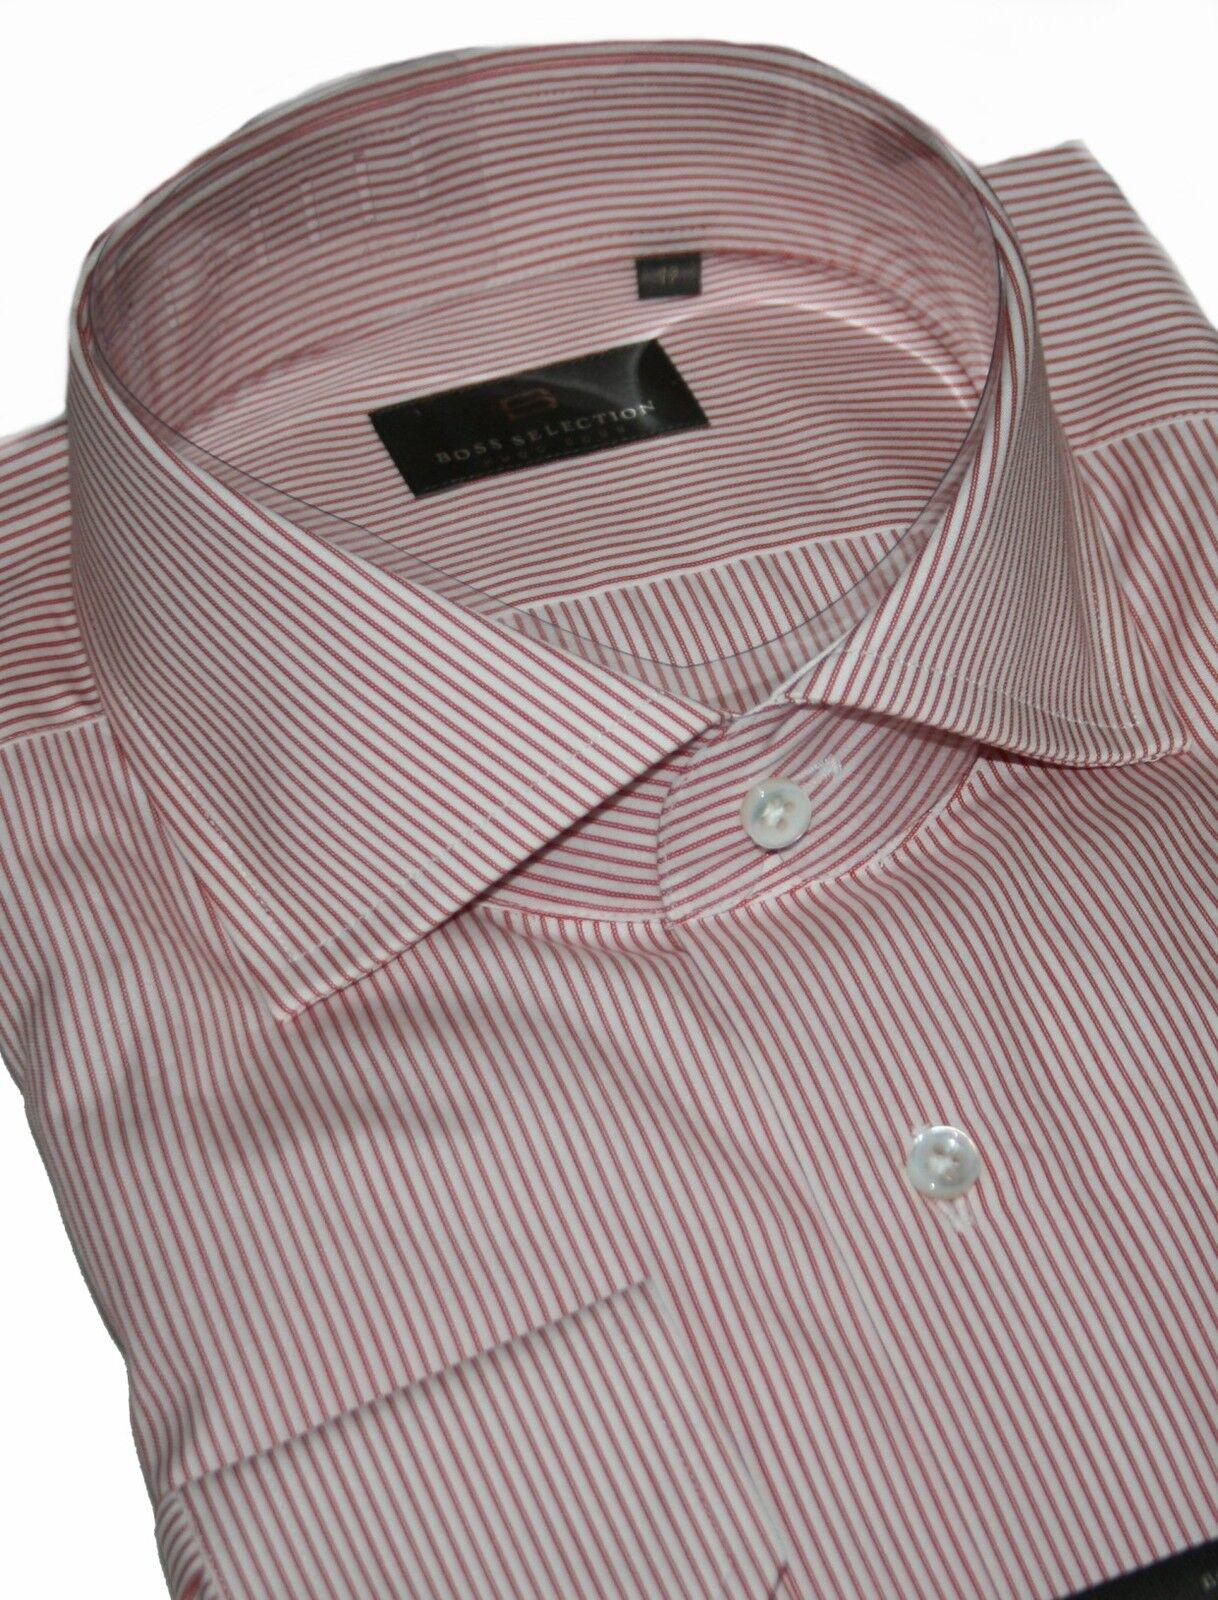 Hugo Boss Selection 50239263 Dark ROT Stripe Walton Hemd KW.39, 42, 43 & 45